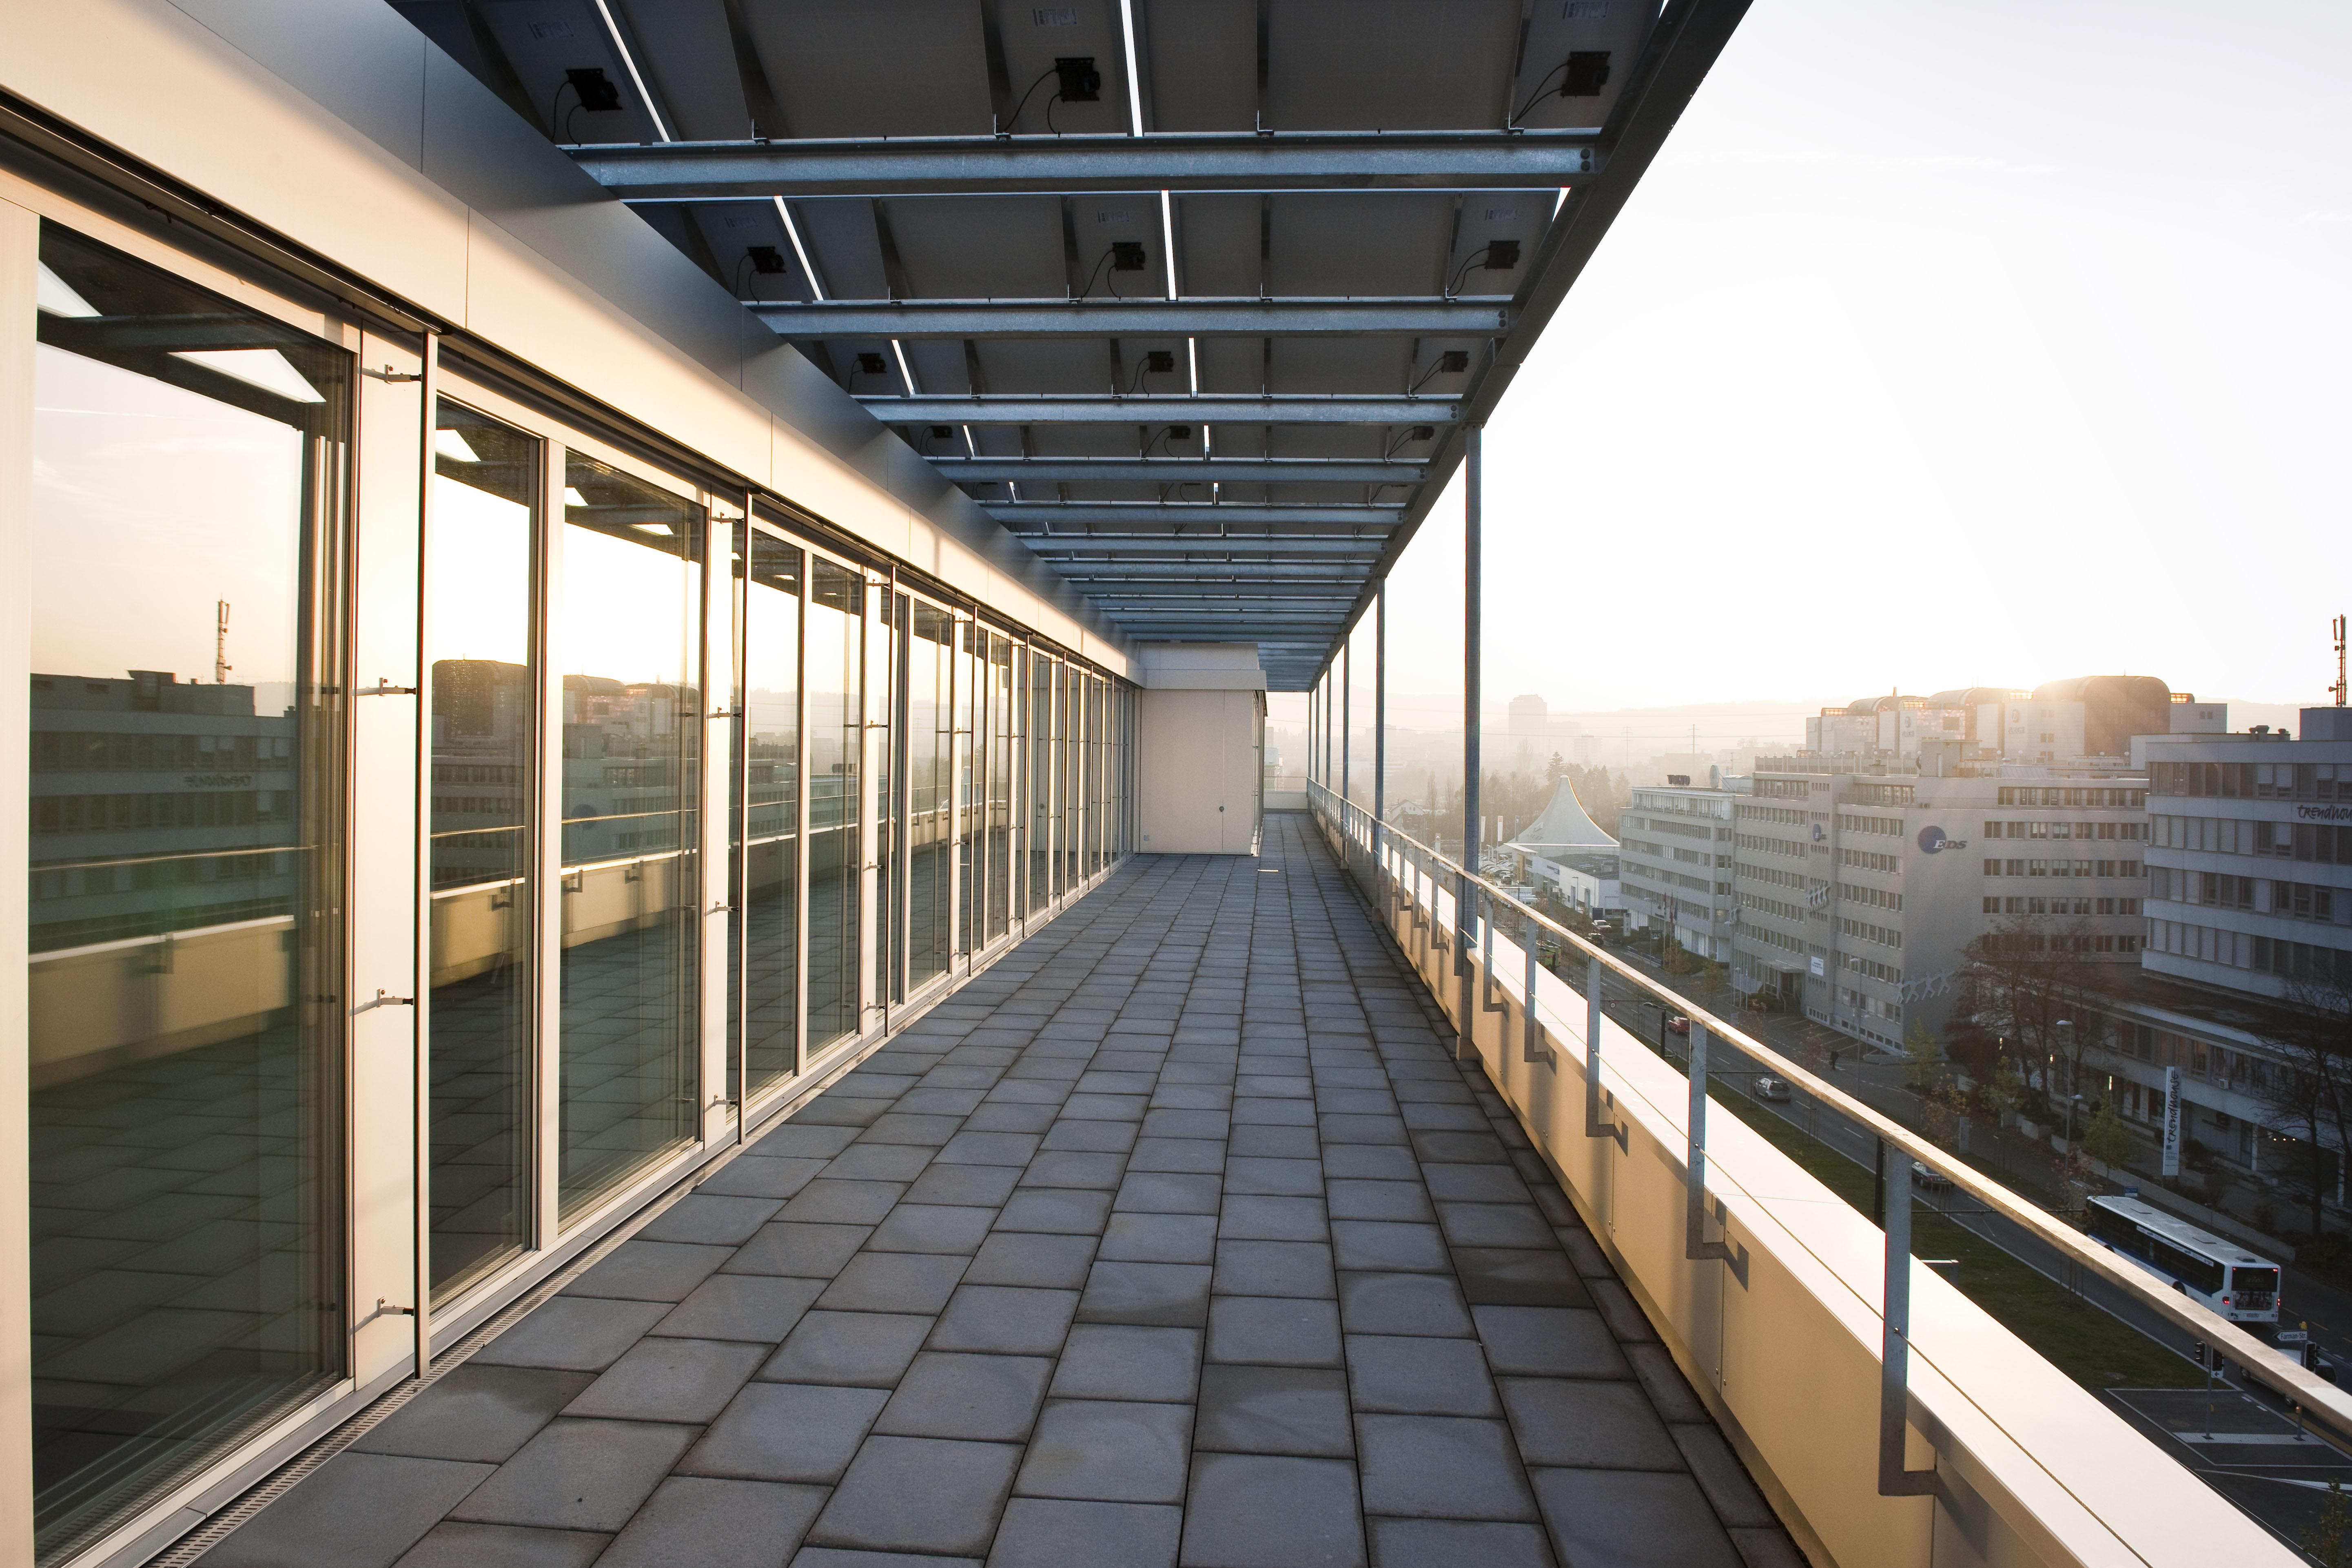 ERNE Holzbau Bürogebäude Portikon Opfikon Holz-Metall-Fenster Systemtüren Pfosten-Riegel-Fassade